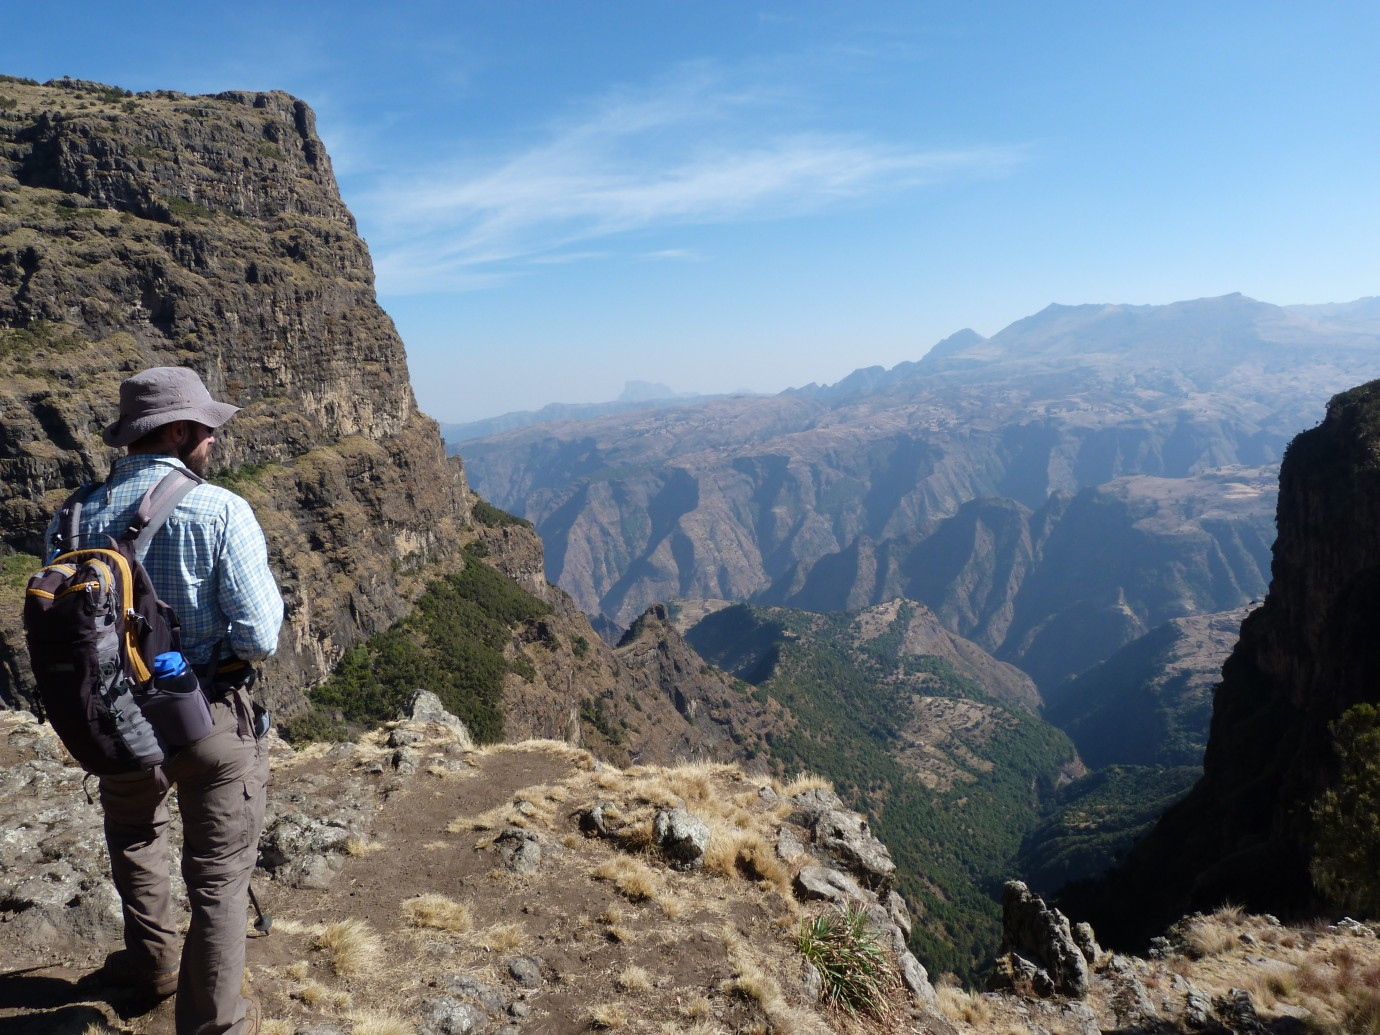 Trekking in Ethiopia - KE Adventure Travel